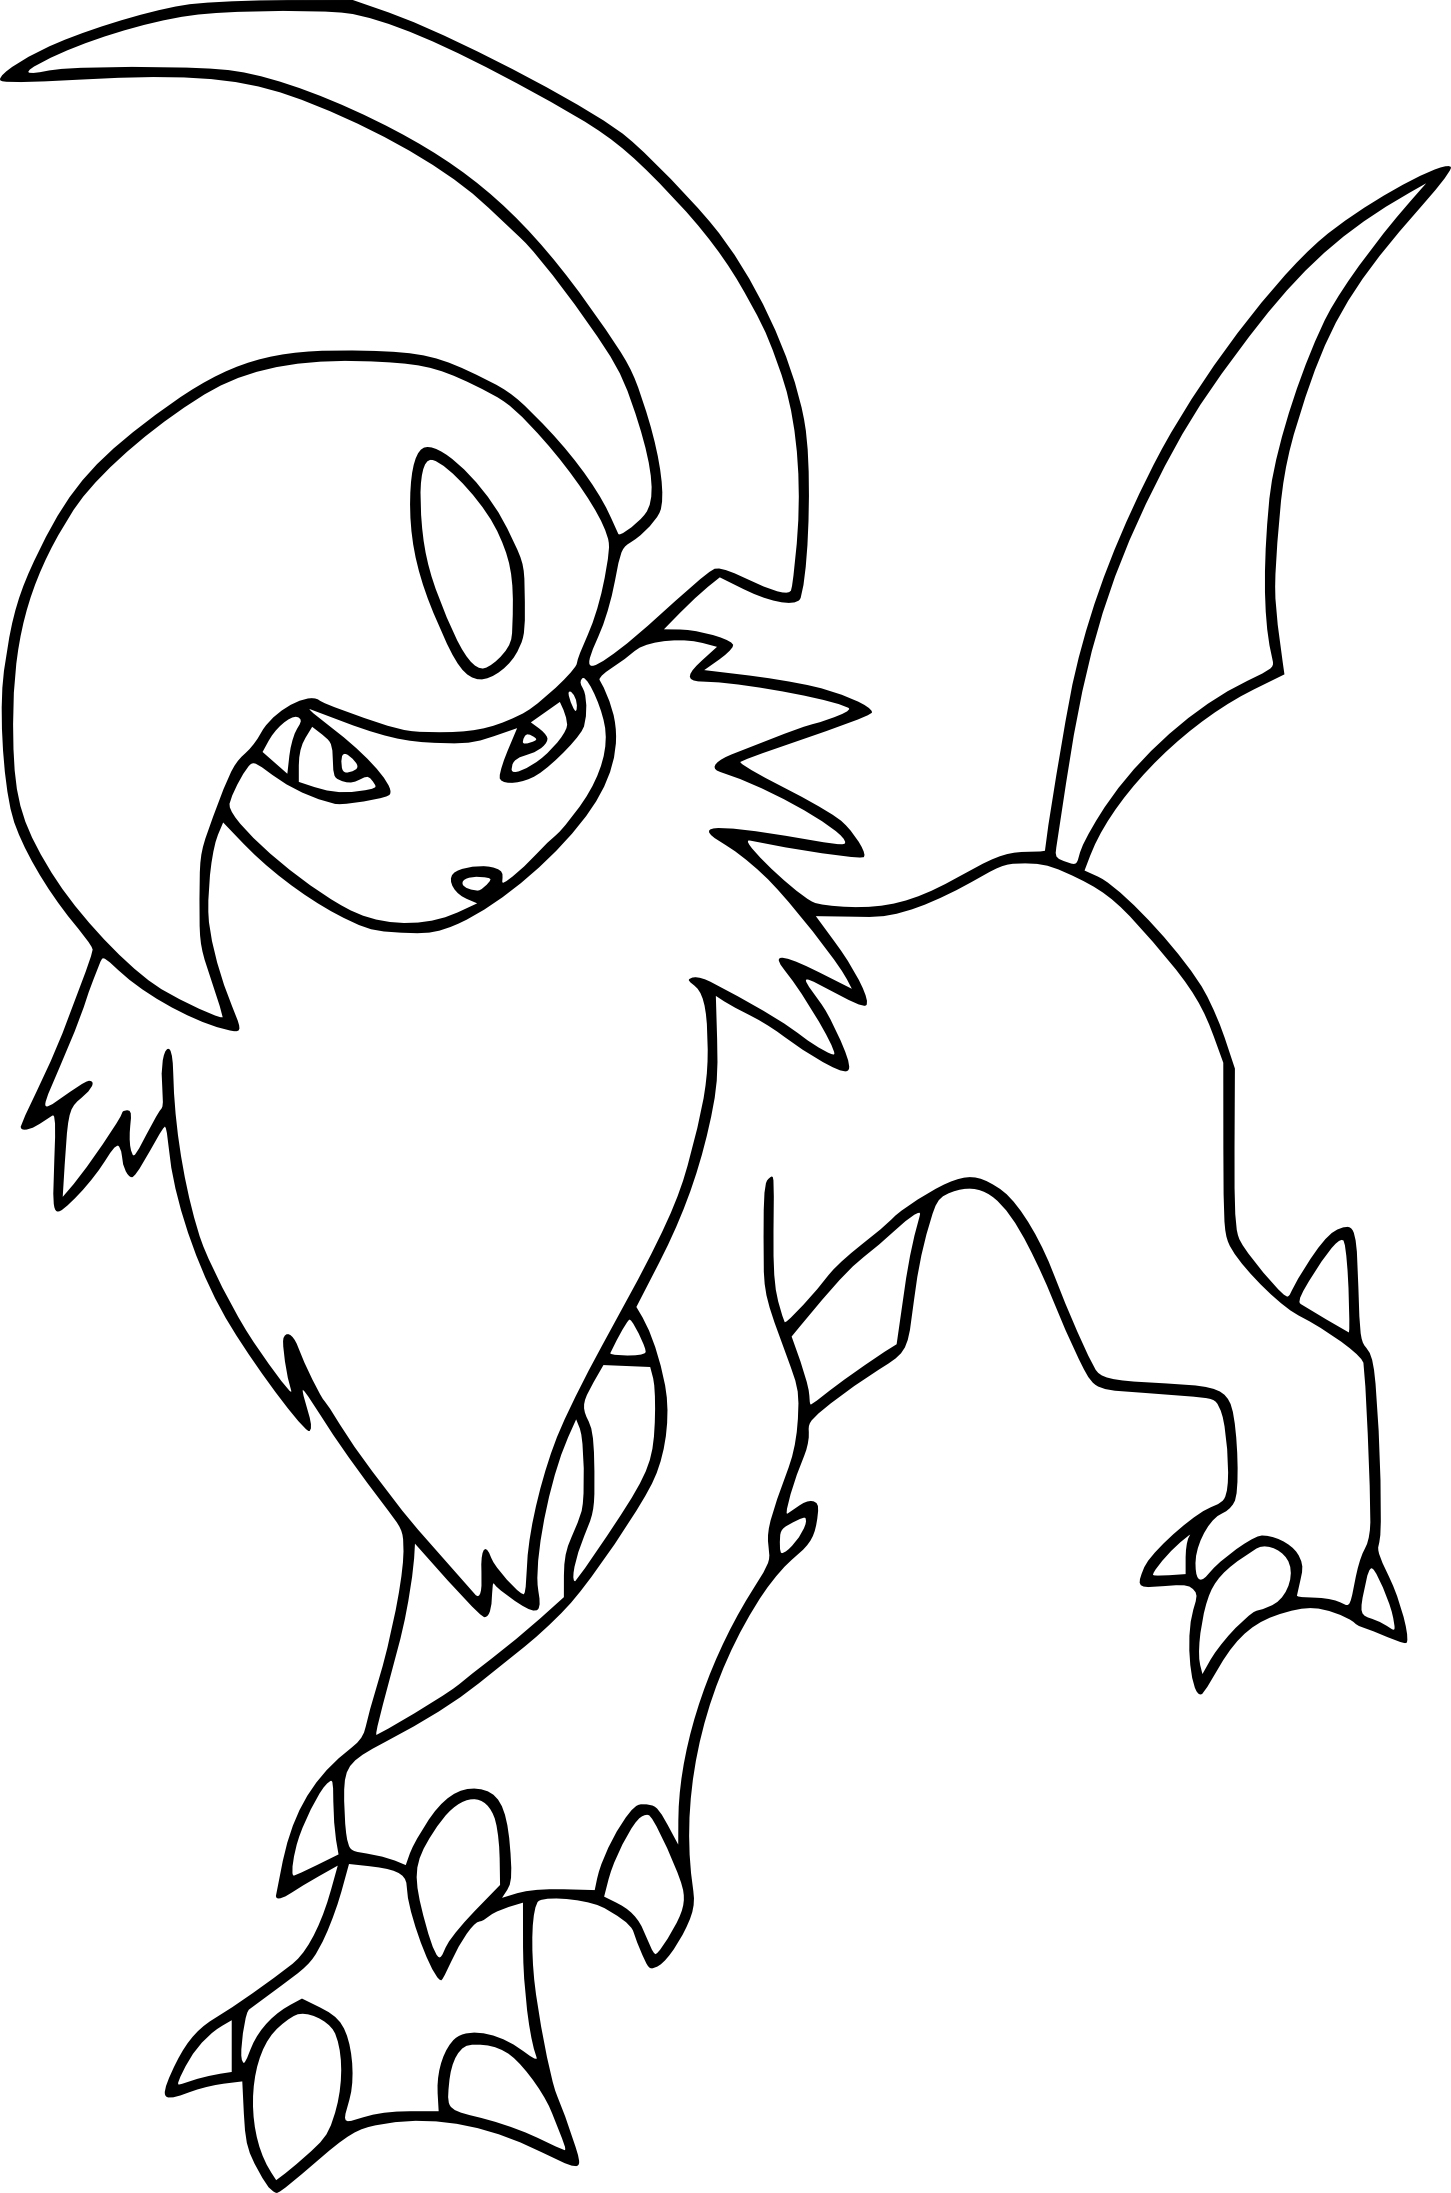 Beau Dessin A Imprimer Pokemon Absol – Mademoiselleosaki avec Coloriage À Imprimer Pokemon Xy